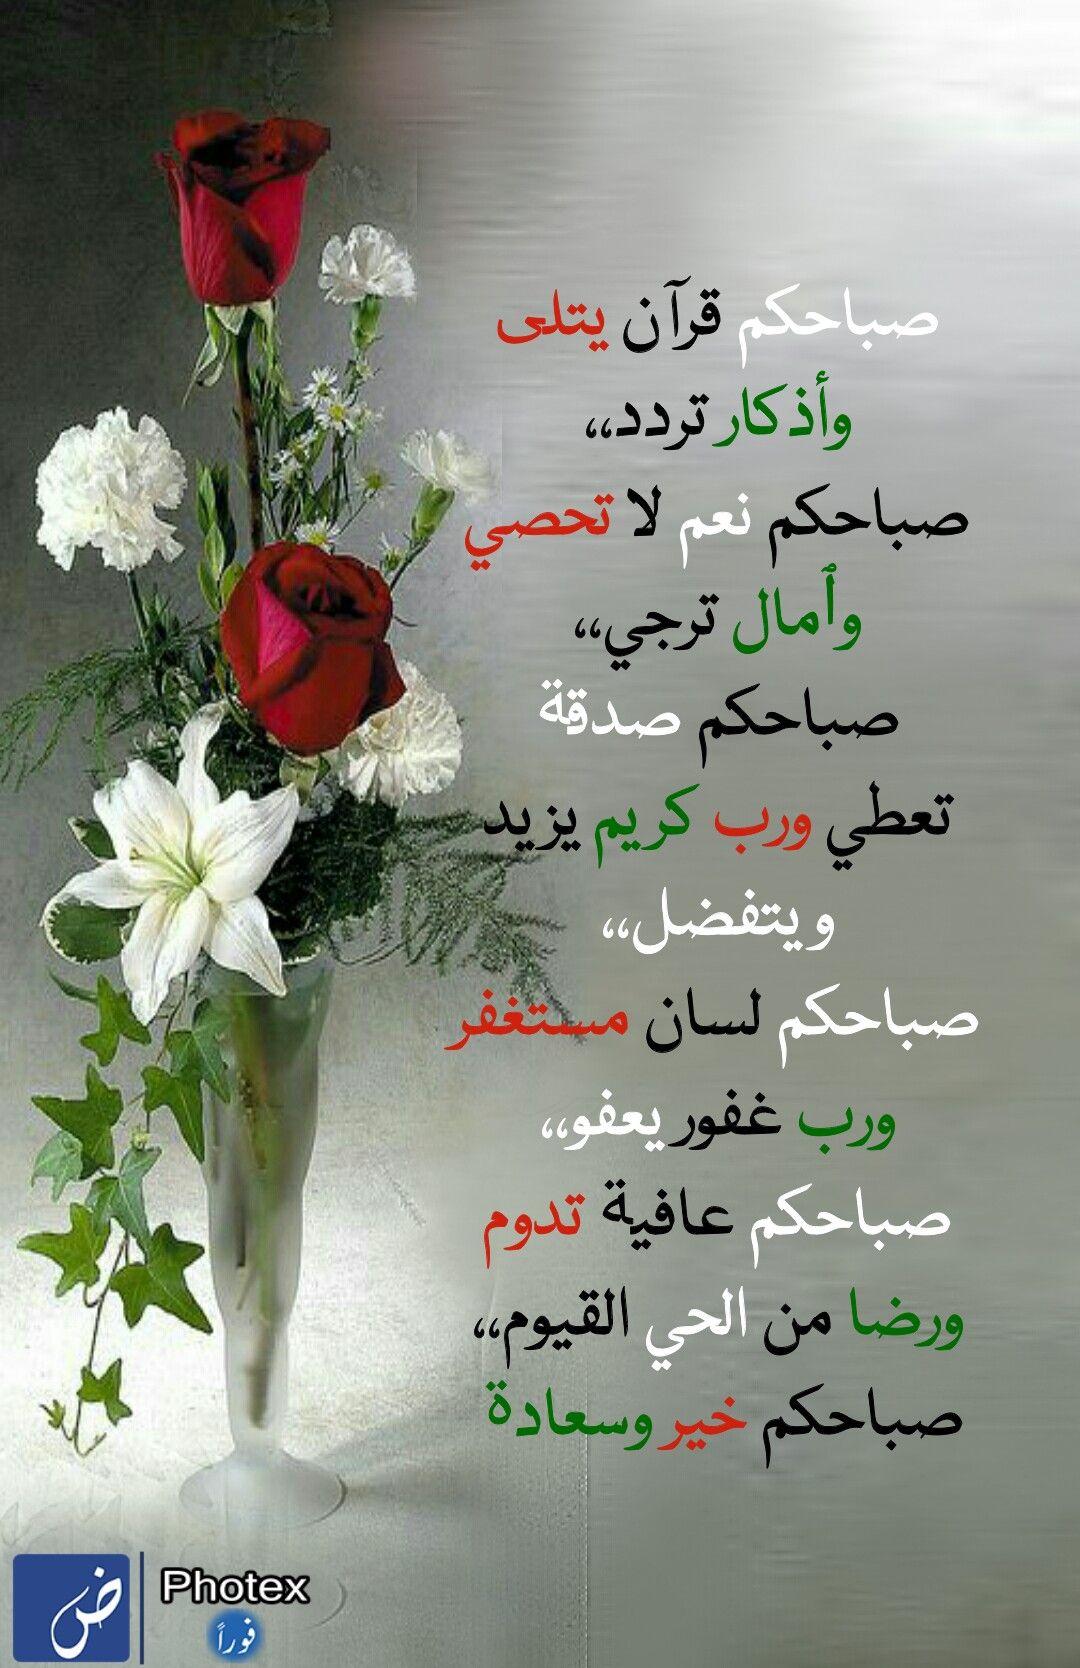 Pin By Hanan Allam On Hanan Good Morning Messages Good Morning My Love Morning Quotes